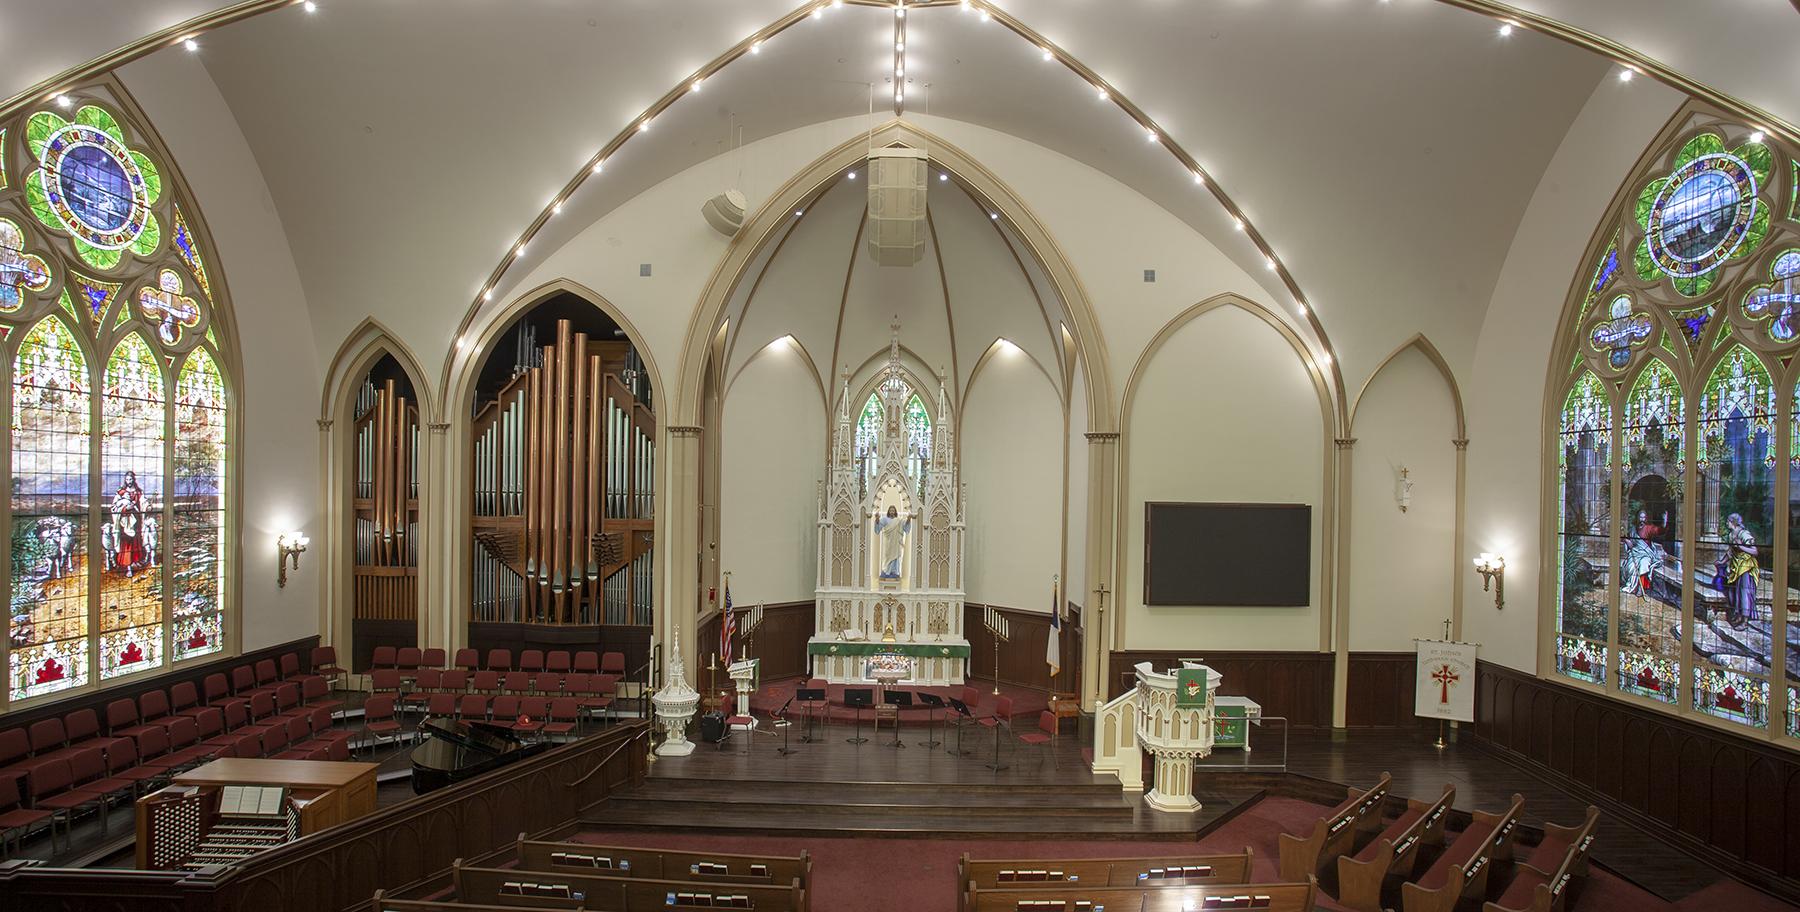 ST JOHN'S LUTHERAN CHURCH of ORANGE -